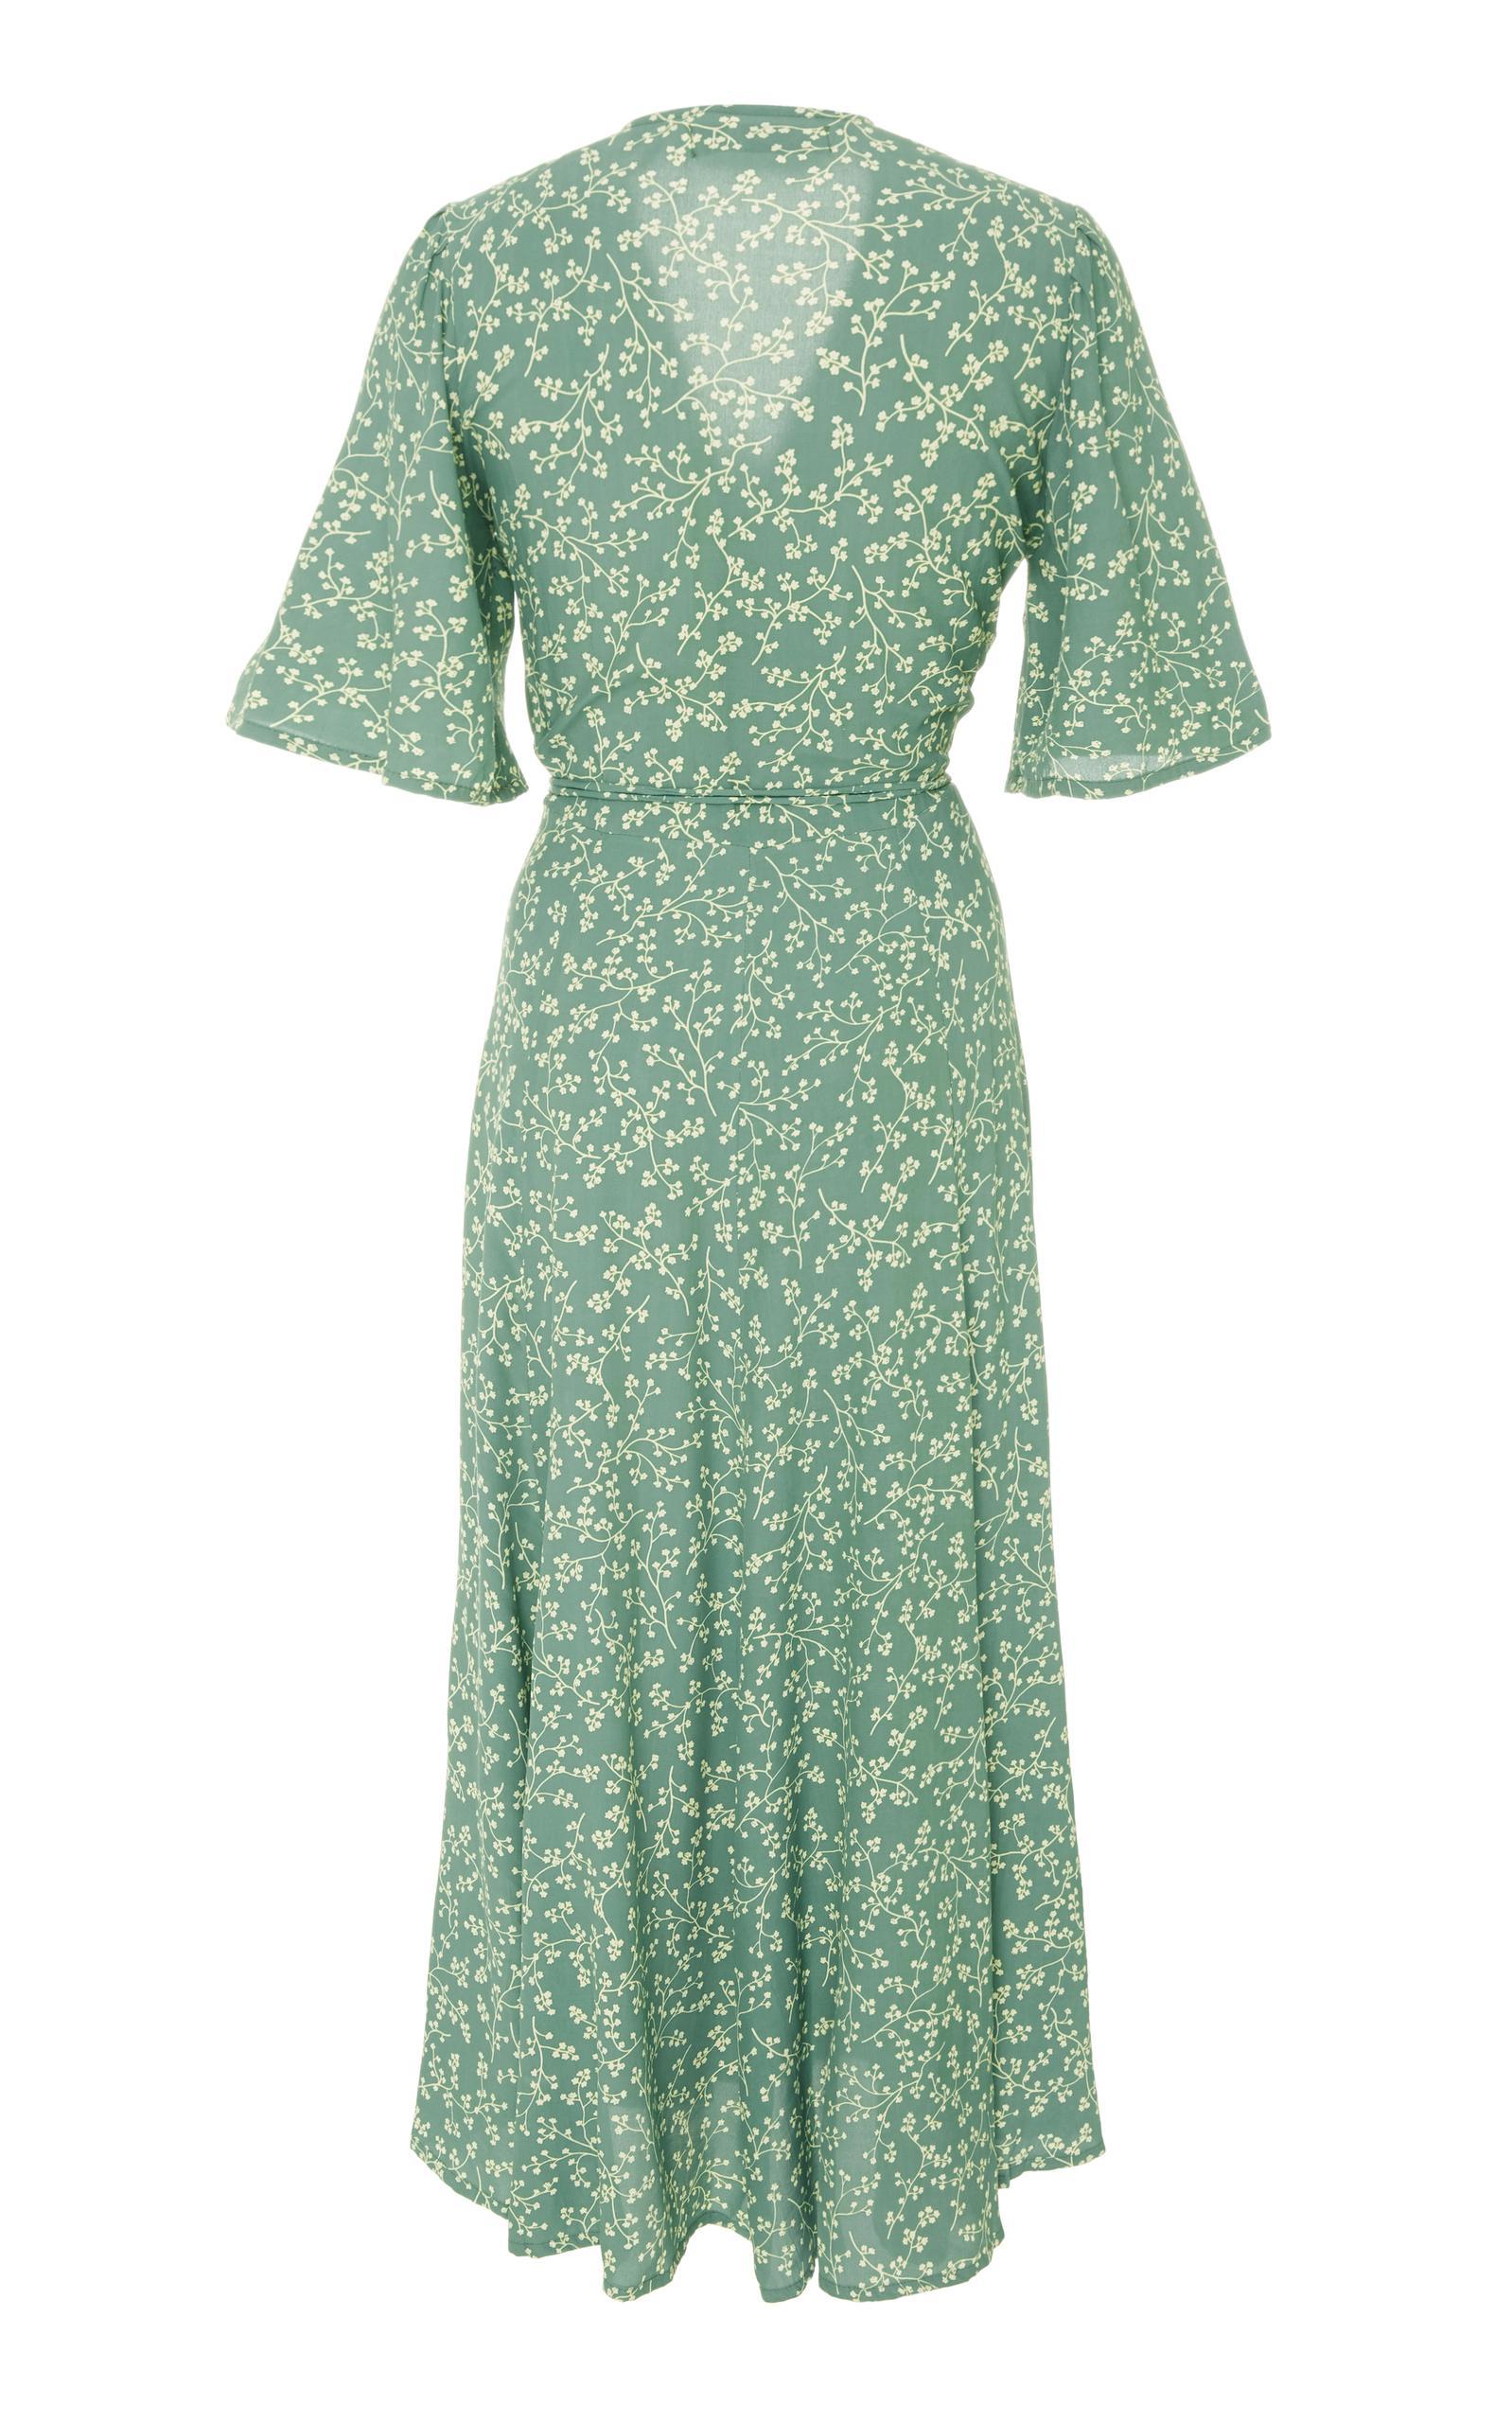 77091e53a6c1 Faithfull The Brand Rivera Midi Dress in Green - Lyst